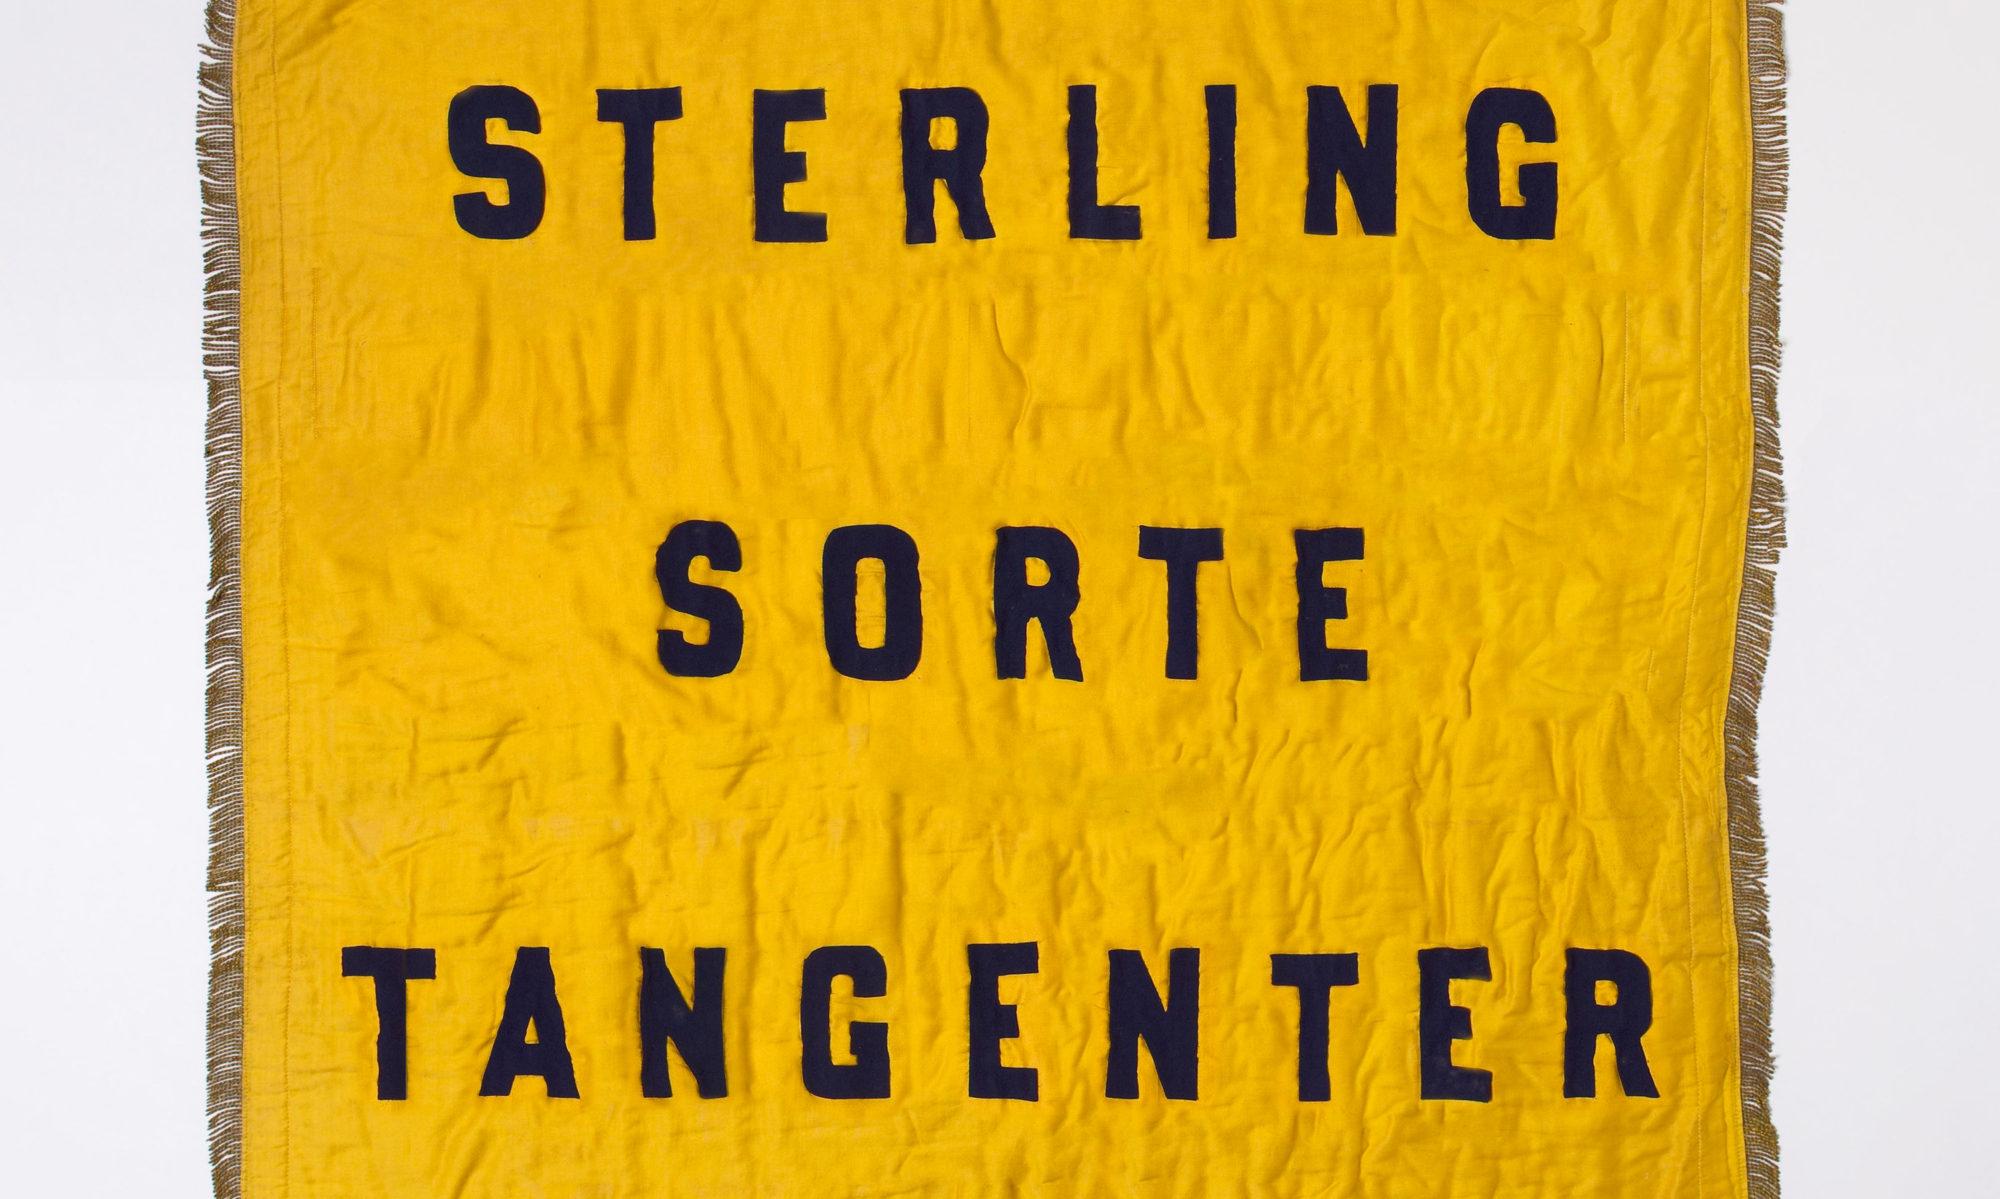 SterlingNET.dk